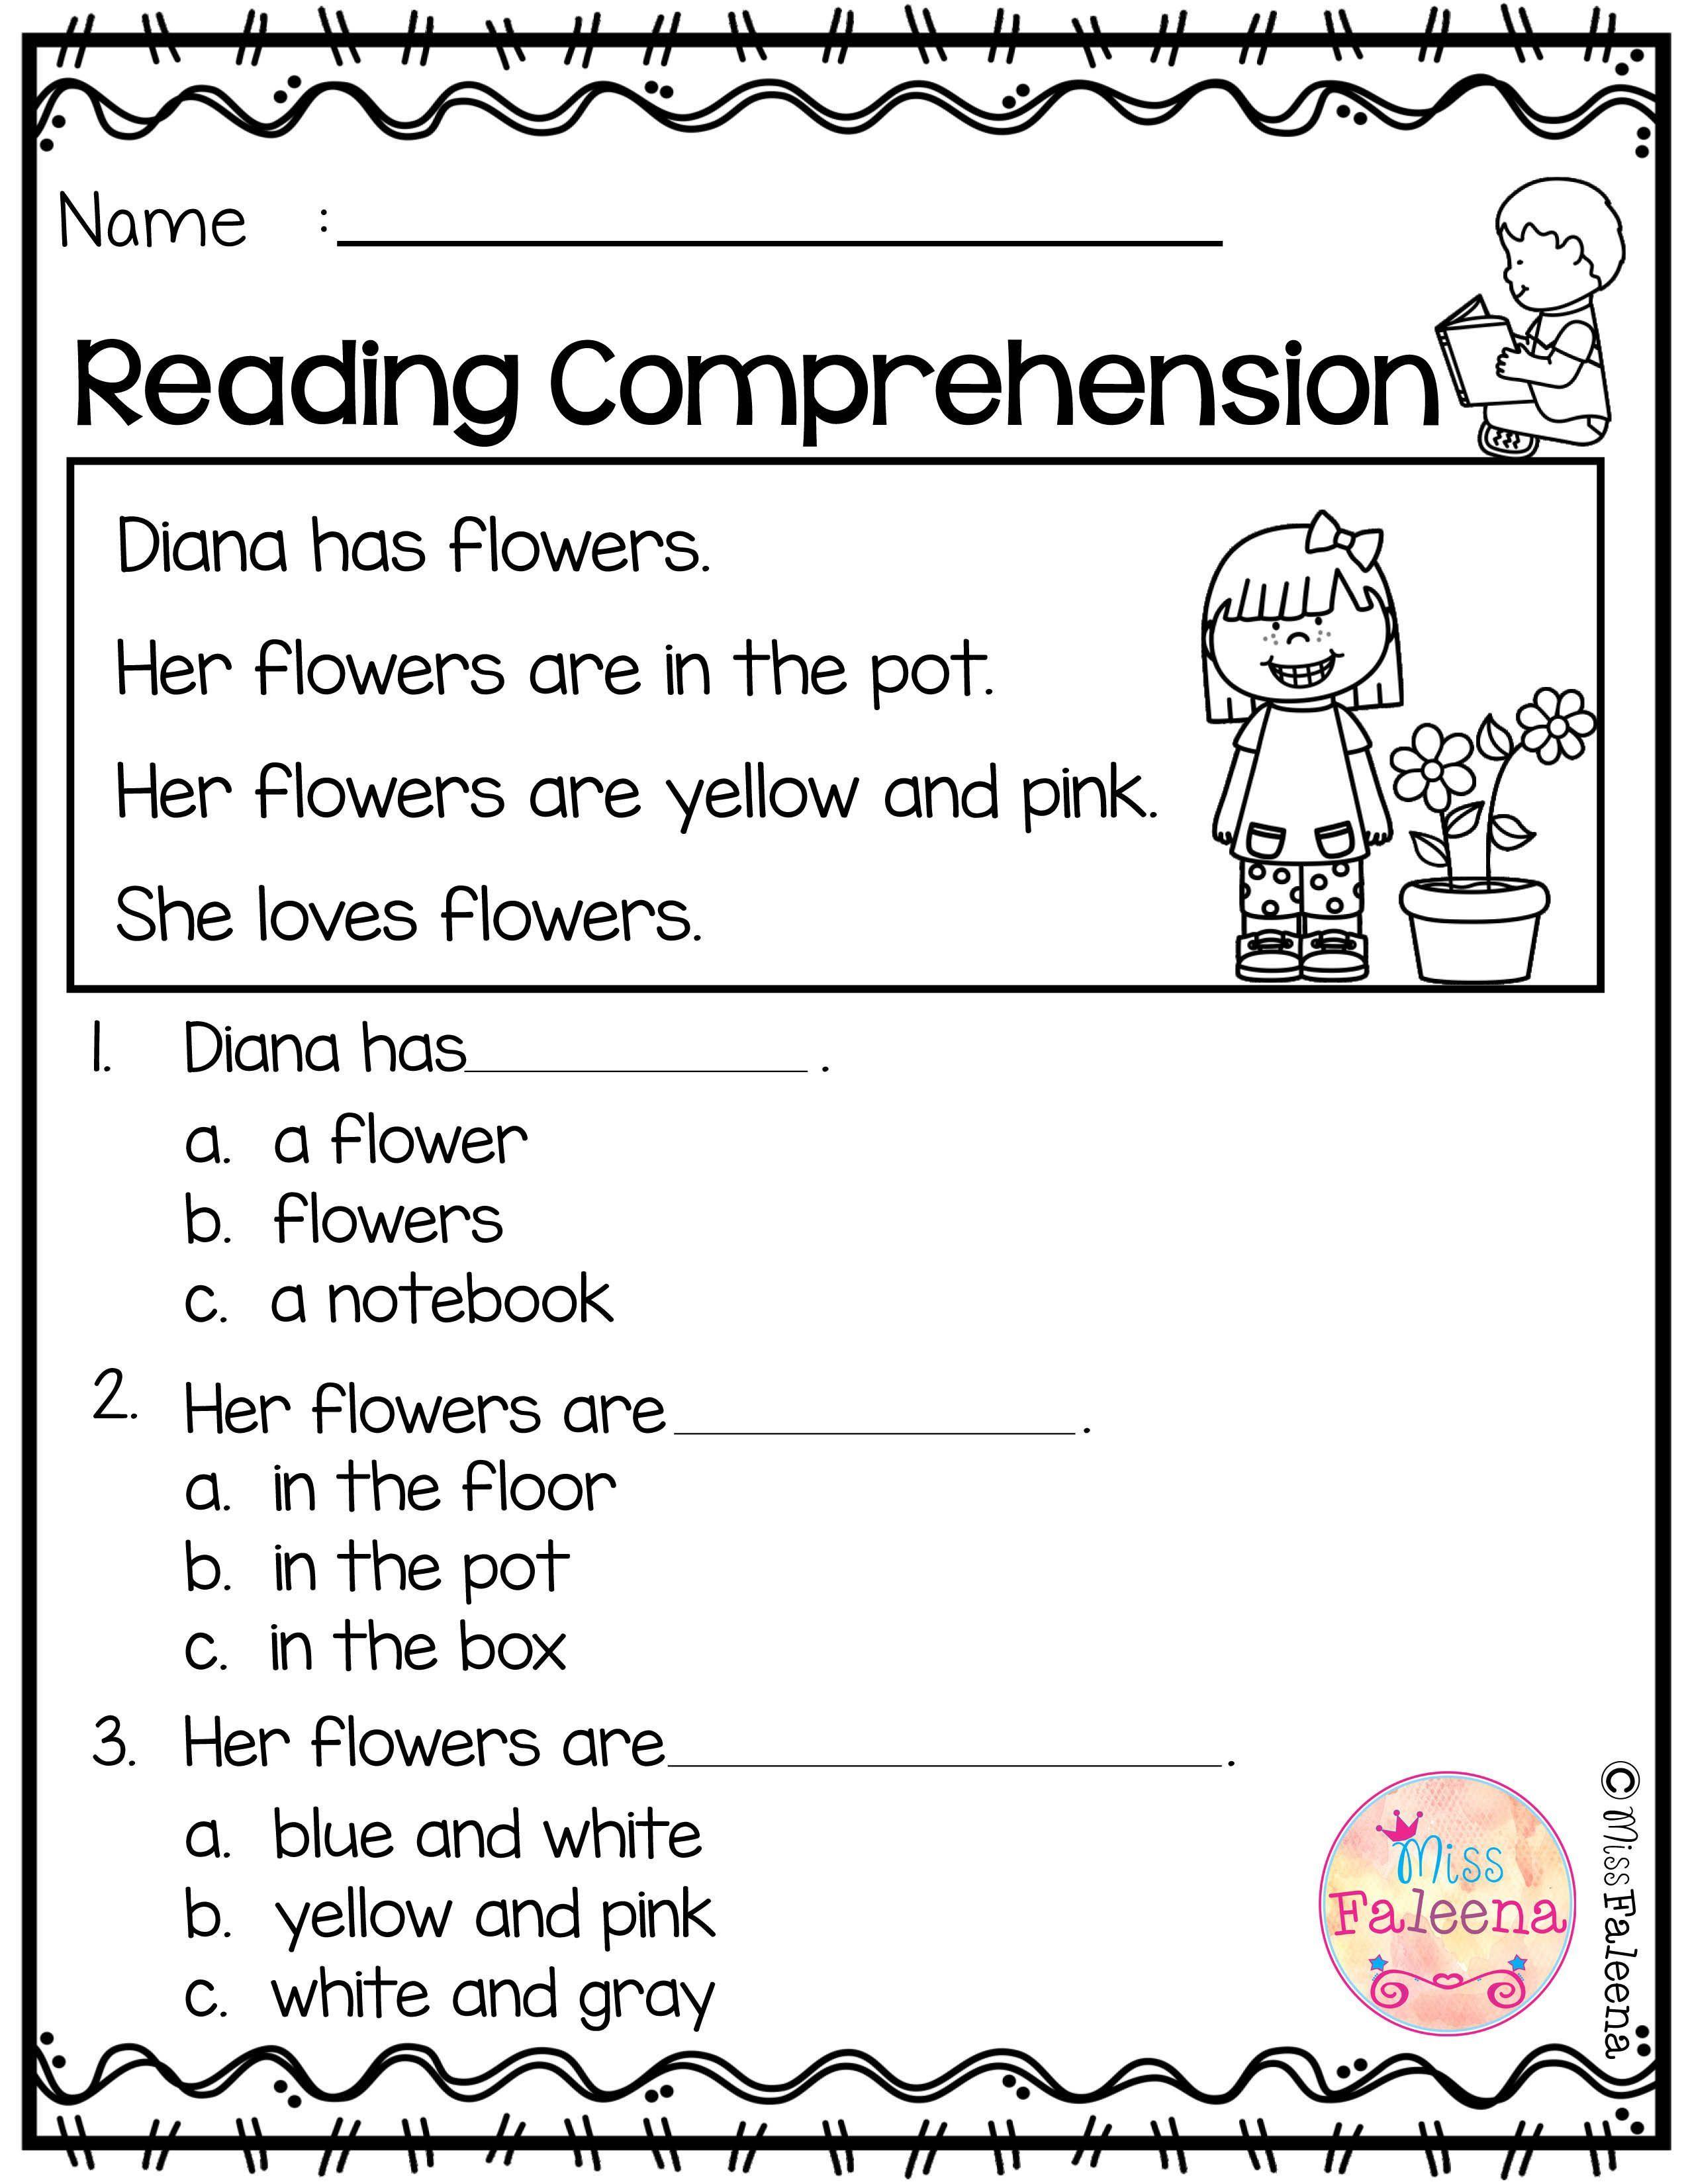 Free Printable Reading Worksheets For Preschool